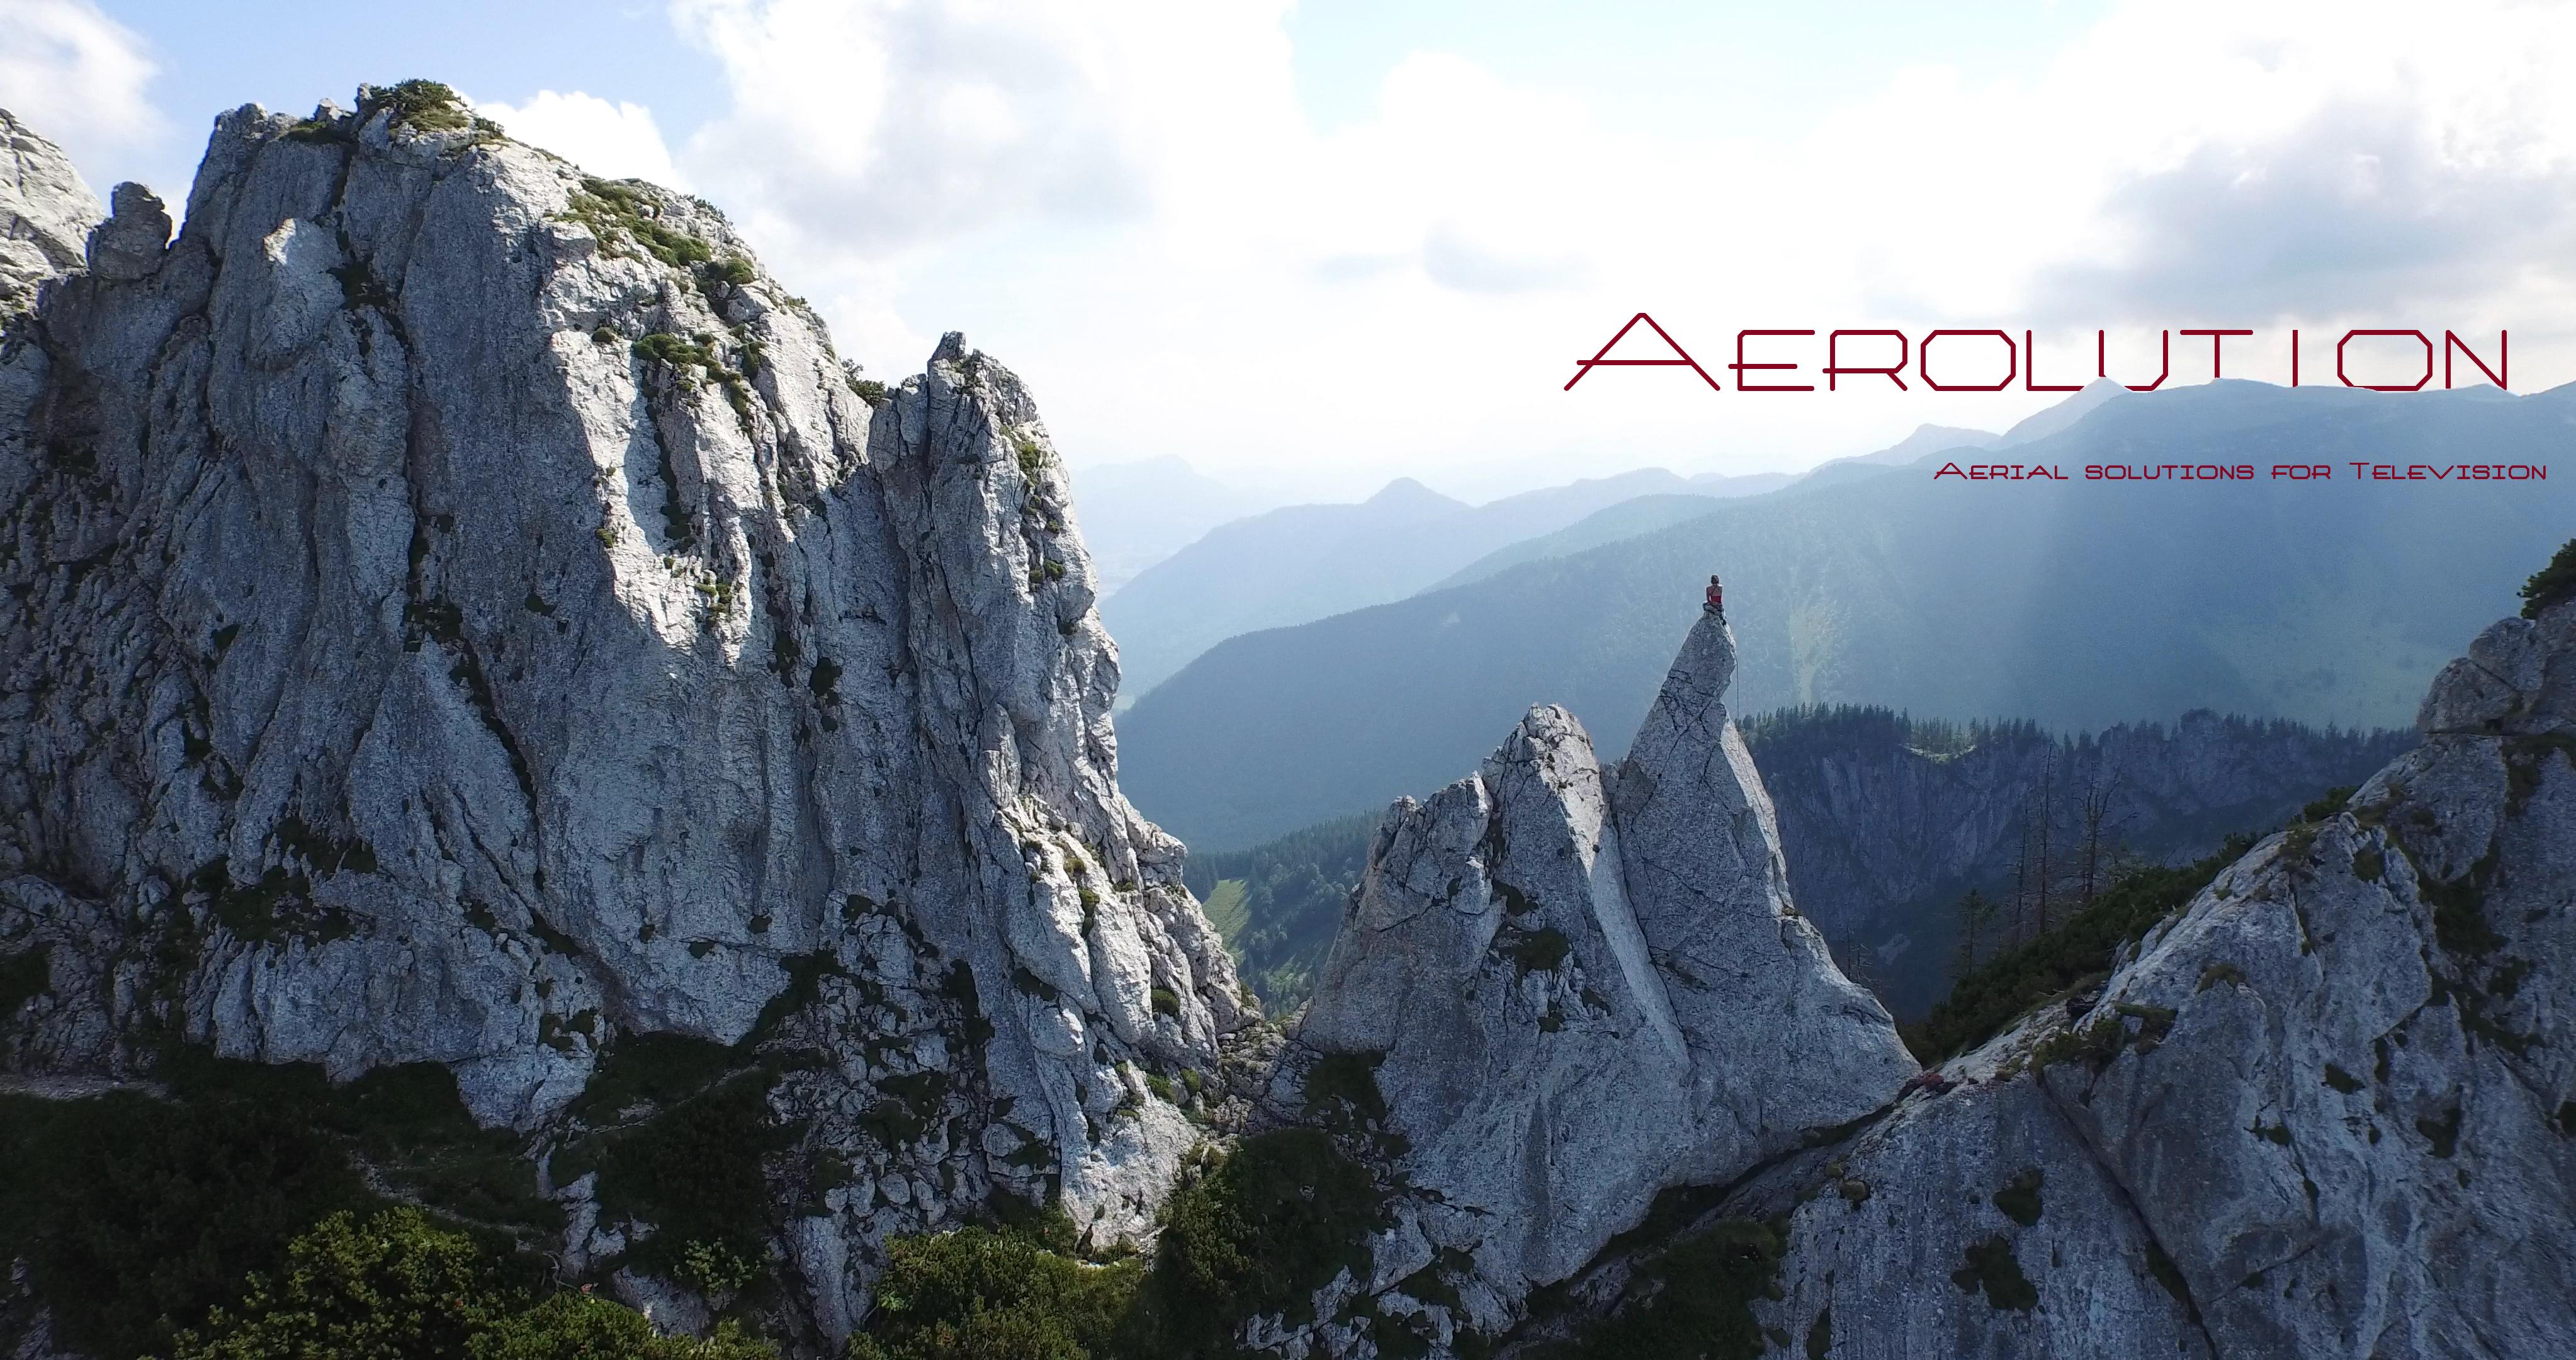 dji drohnenteam race drohne 300.000 lumen LED Drohne München Alexa Mini Flugaufnahmen RED Weapon Helium 8K 150.000 lumen drohen münchen Flugaufnahmen Drohnenteam munich aerials drone